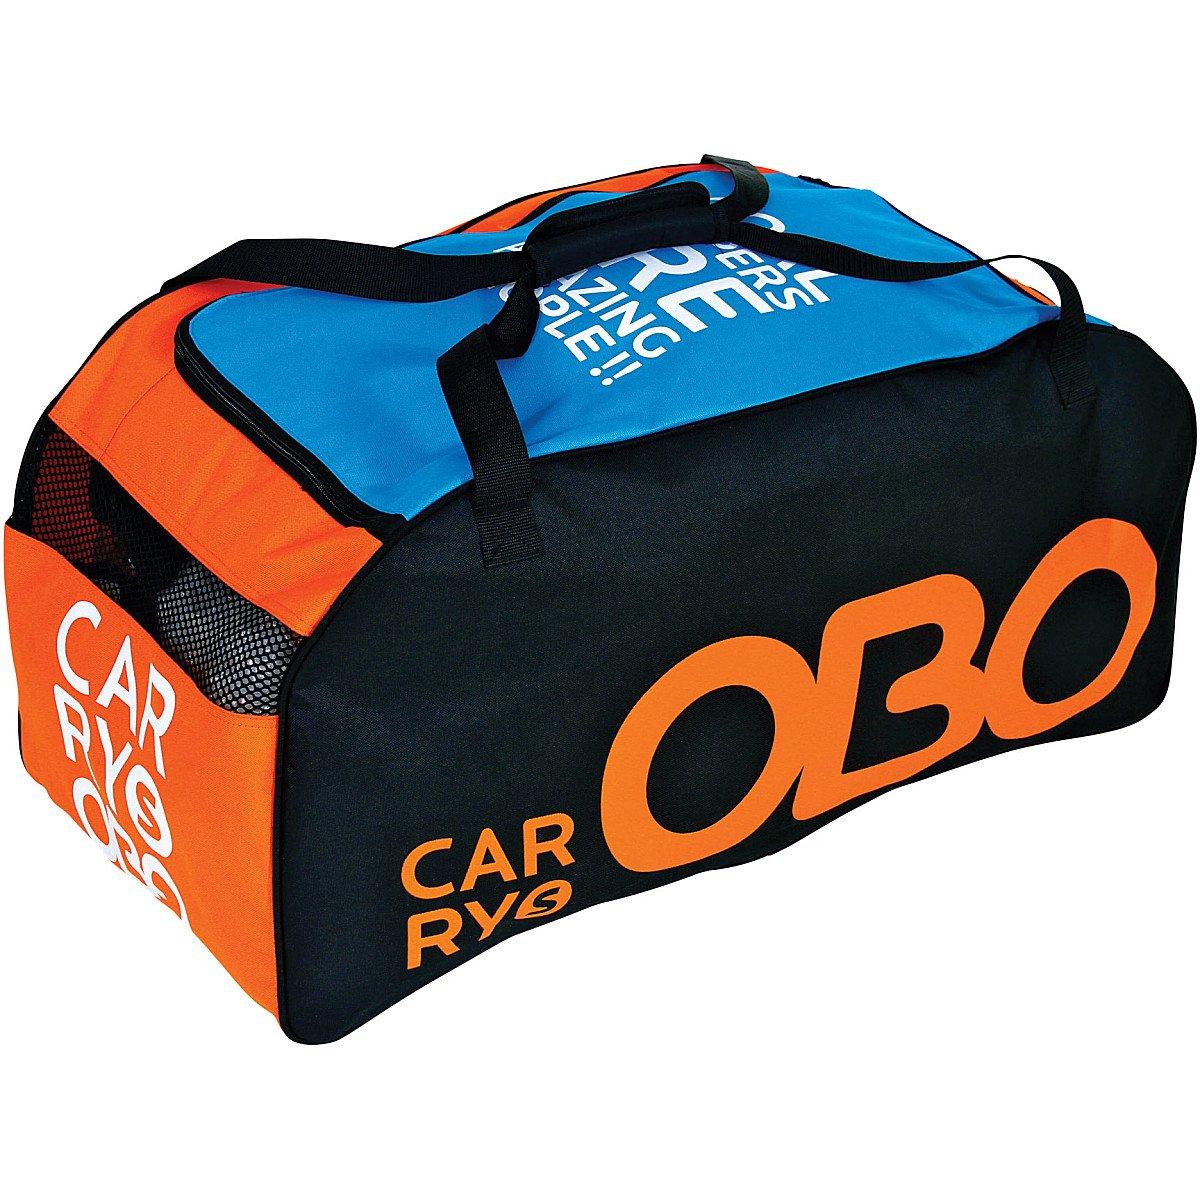 Cheap Hockey Bag Goalie Find Hockey Bag Goalie Deals On Line At